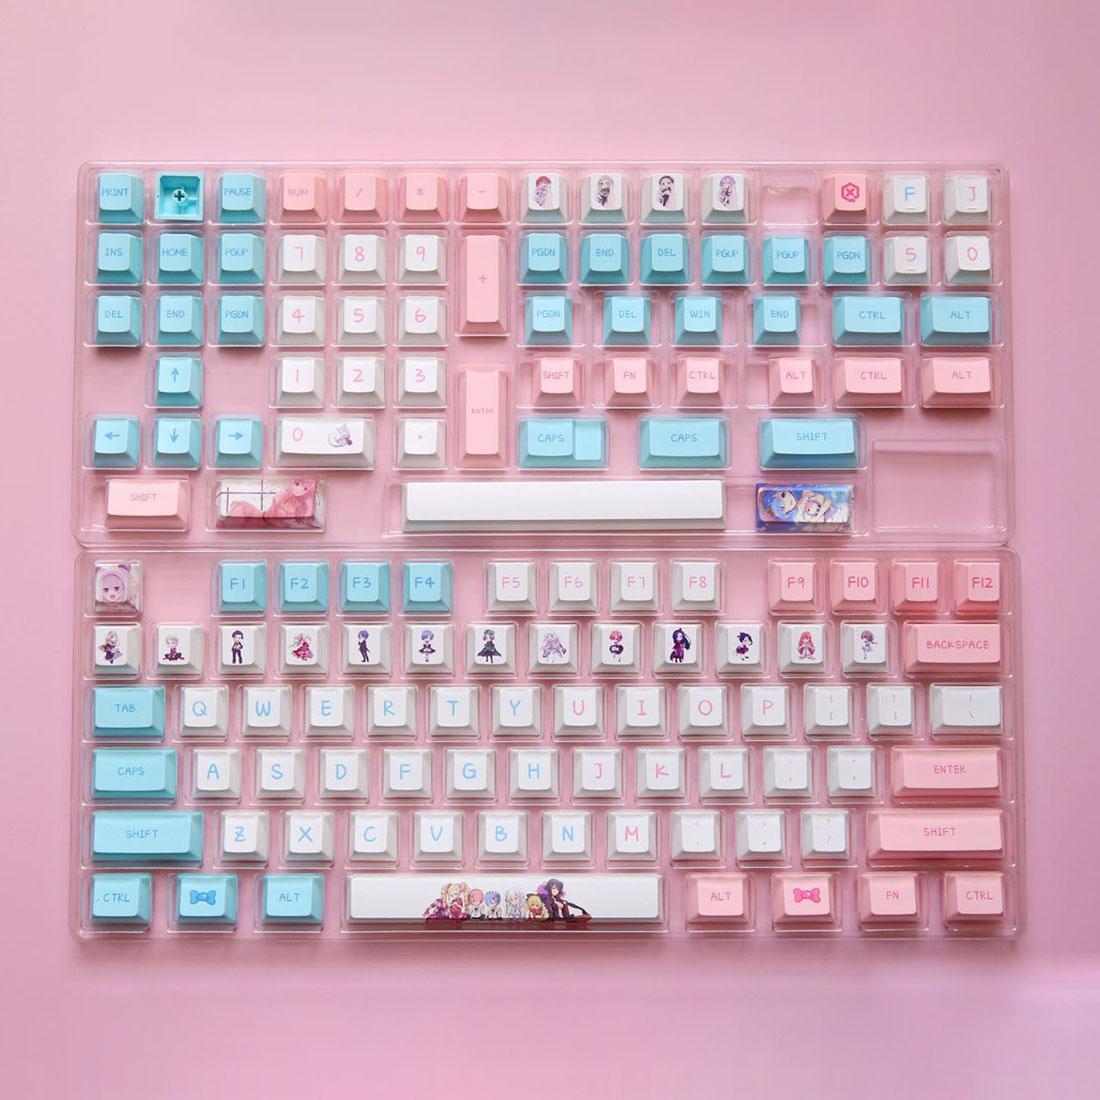 138pcs Keycaps Set Anime PBT Dye-sub with Puller for 61/64/87/96/104 Keys GH60 RK61 Matrix Joke Custom Mechanical Gaming Keyboard